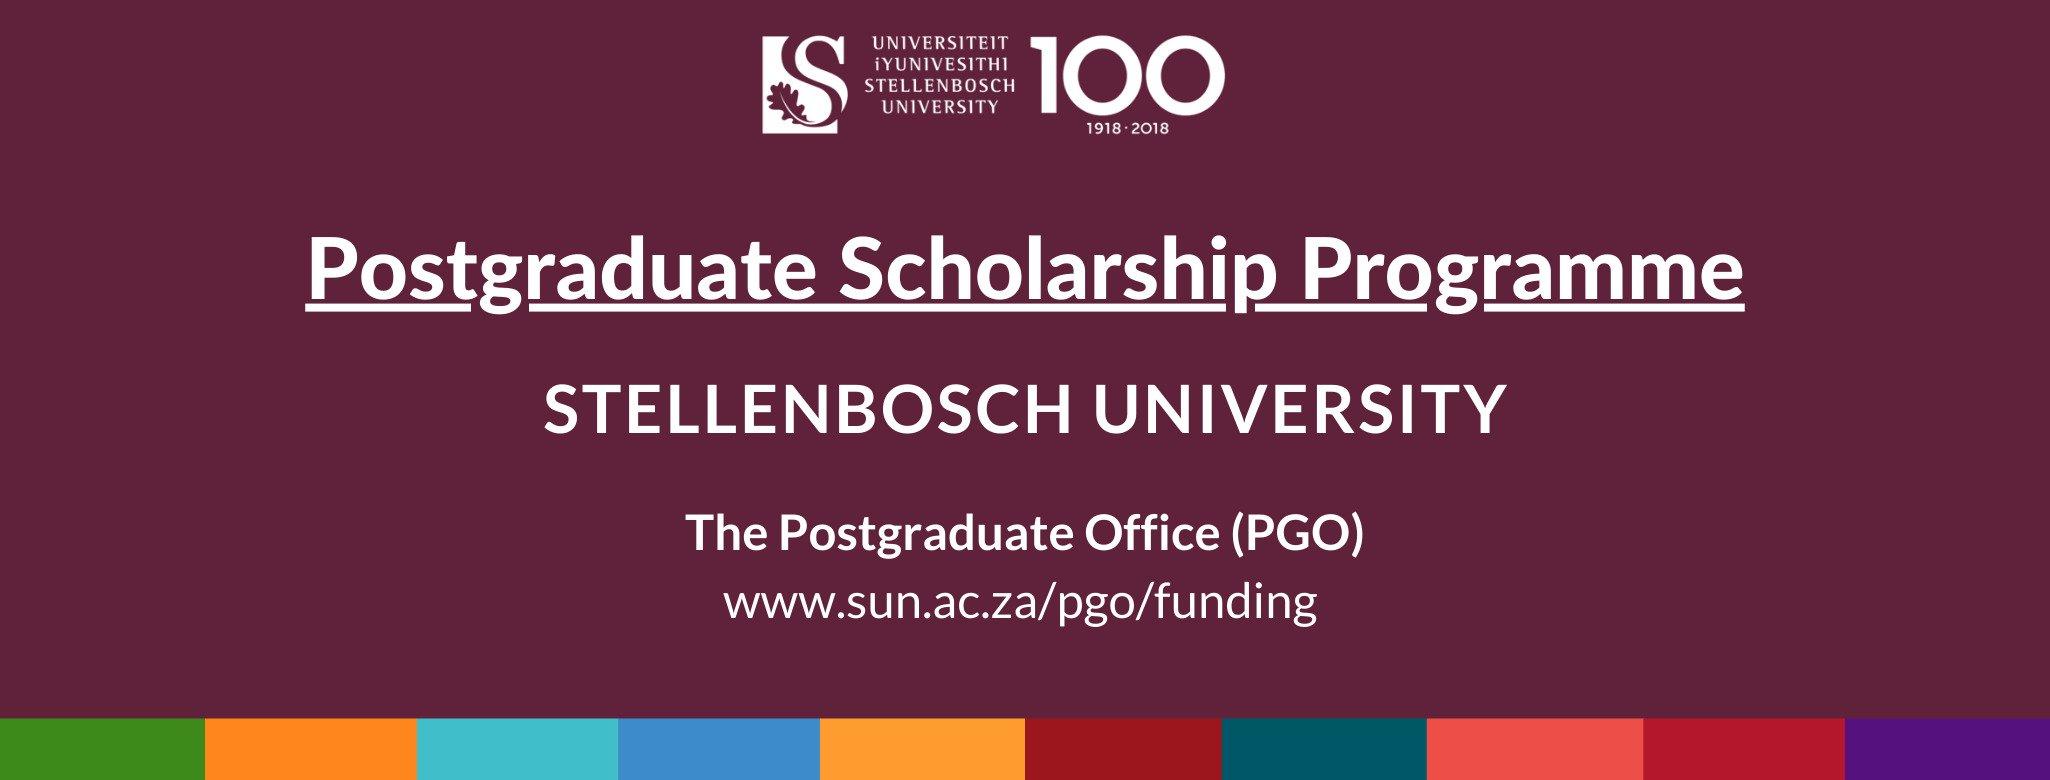 Stellenbosch University Postgraduate Scholarship Programme 2021